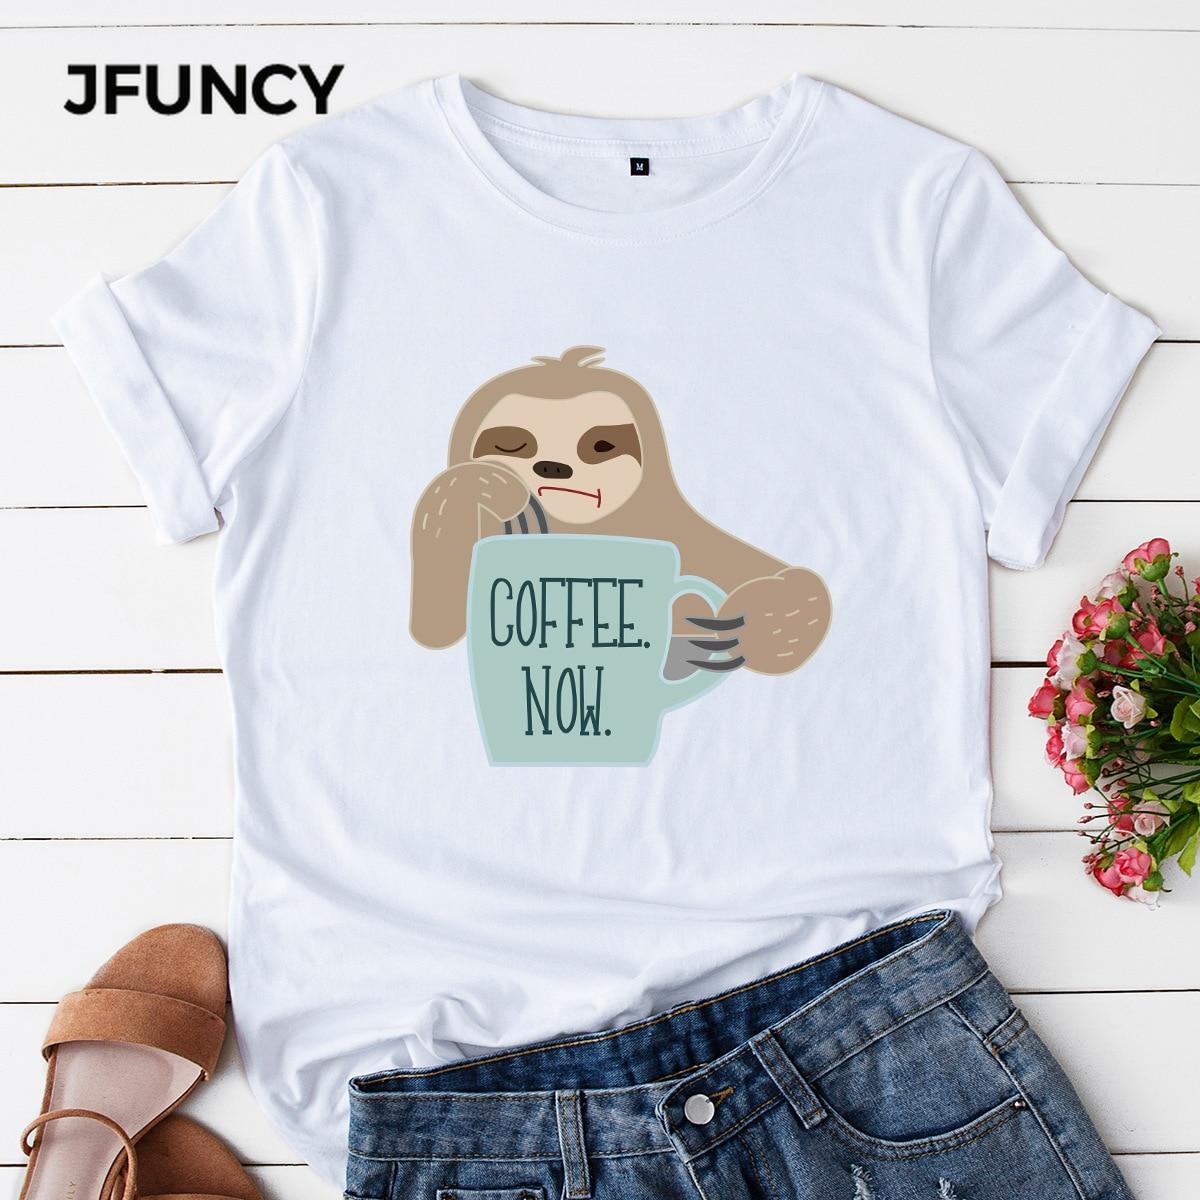 JFUNCY женские футболки размера плюс, женские хлопковые футболки, футболки с принтом кофейного сейчас, женские летние топы, корейские футболки...